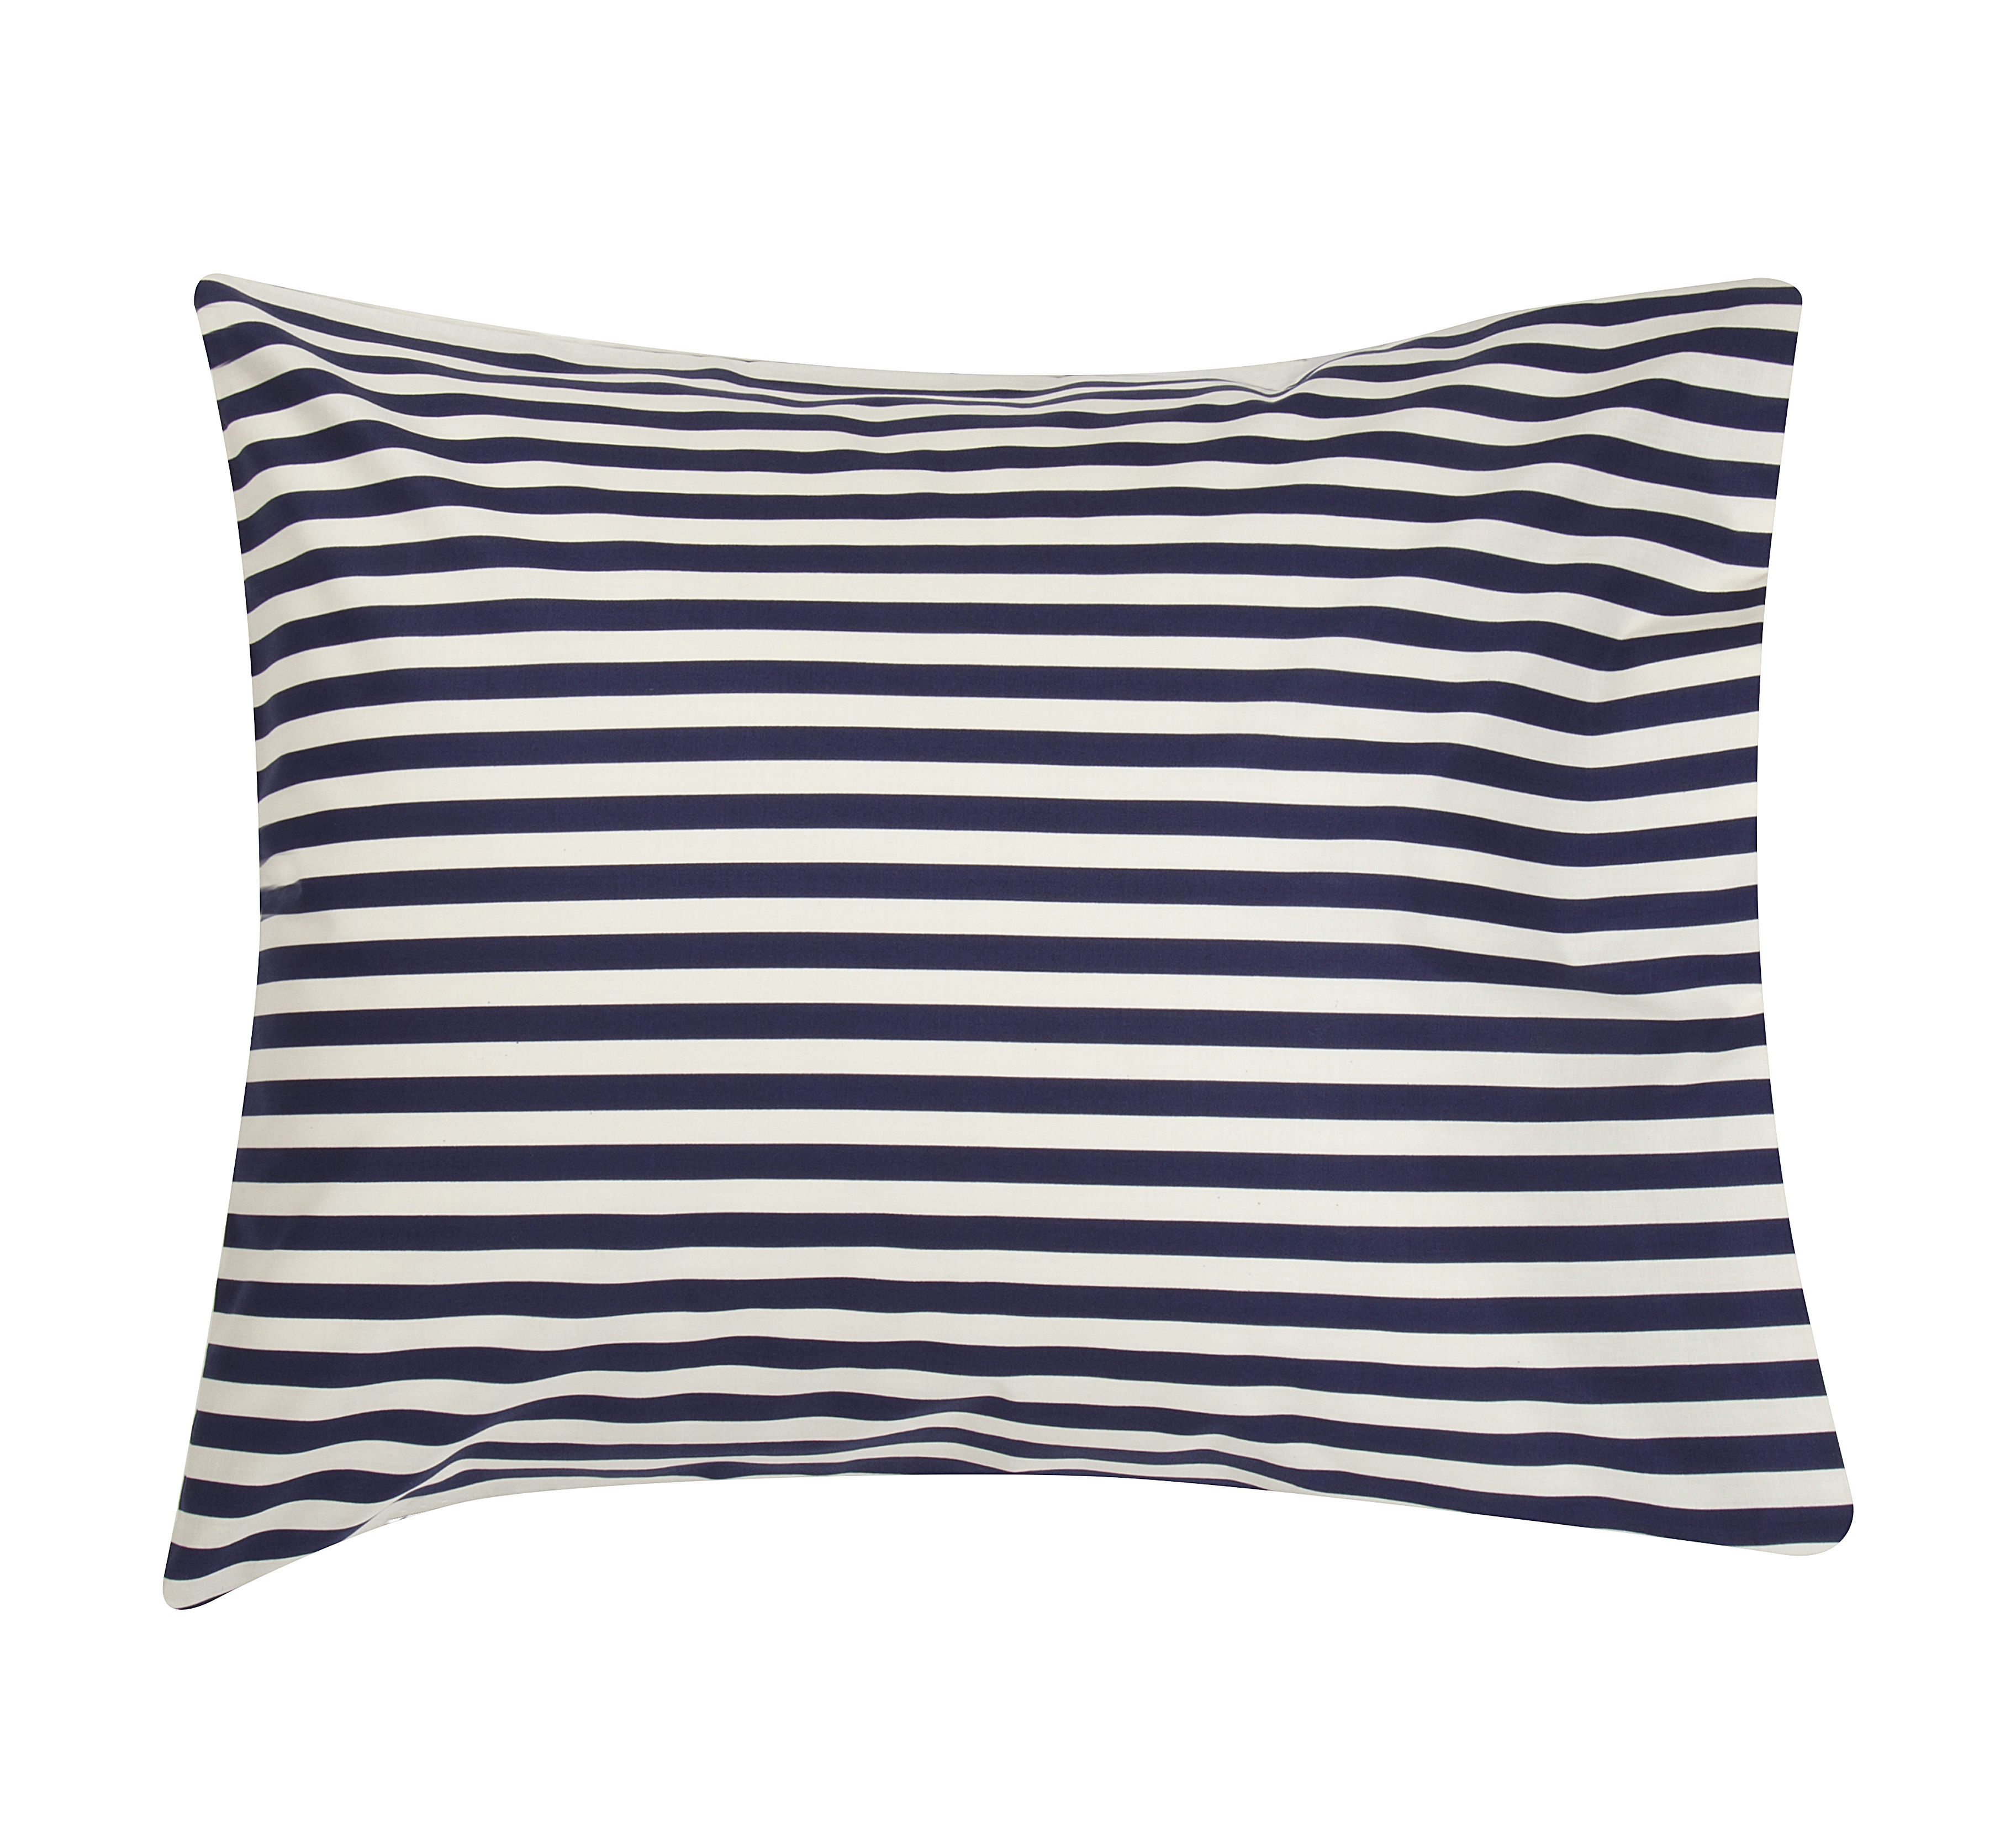 Interni - Cuscini  - federa Oiva Tasaraita - / 65 x 65 cm di Marimekko - Tasaraita / Bianco & blu marine - Cotone